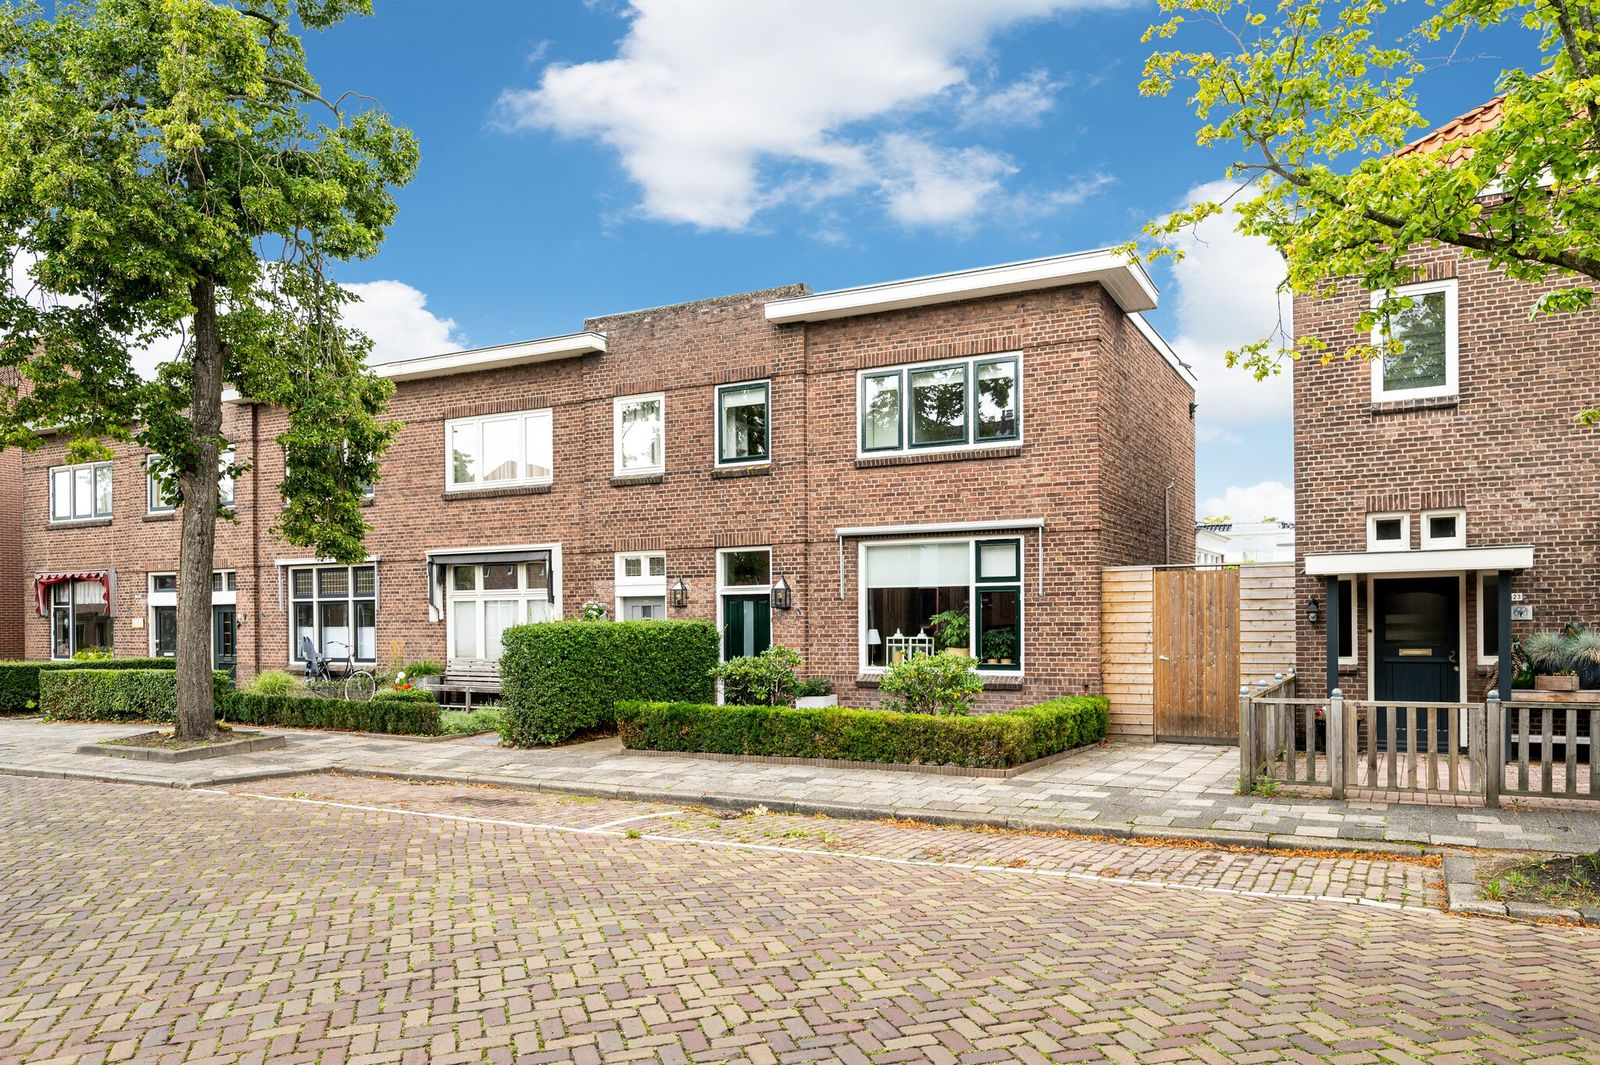 Willem Lodewijkstraat 21, Sneek